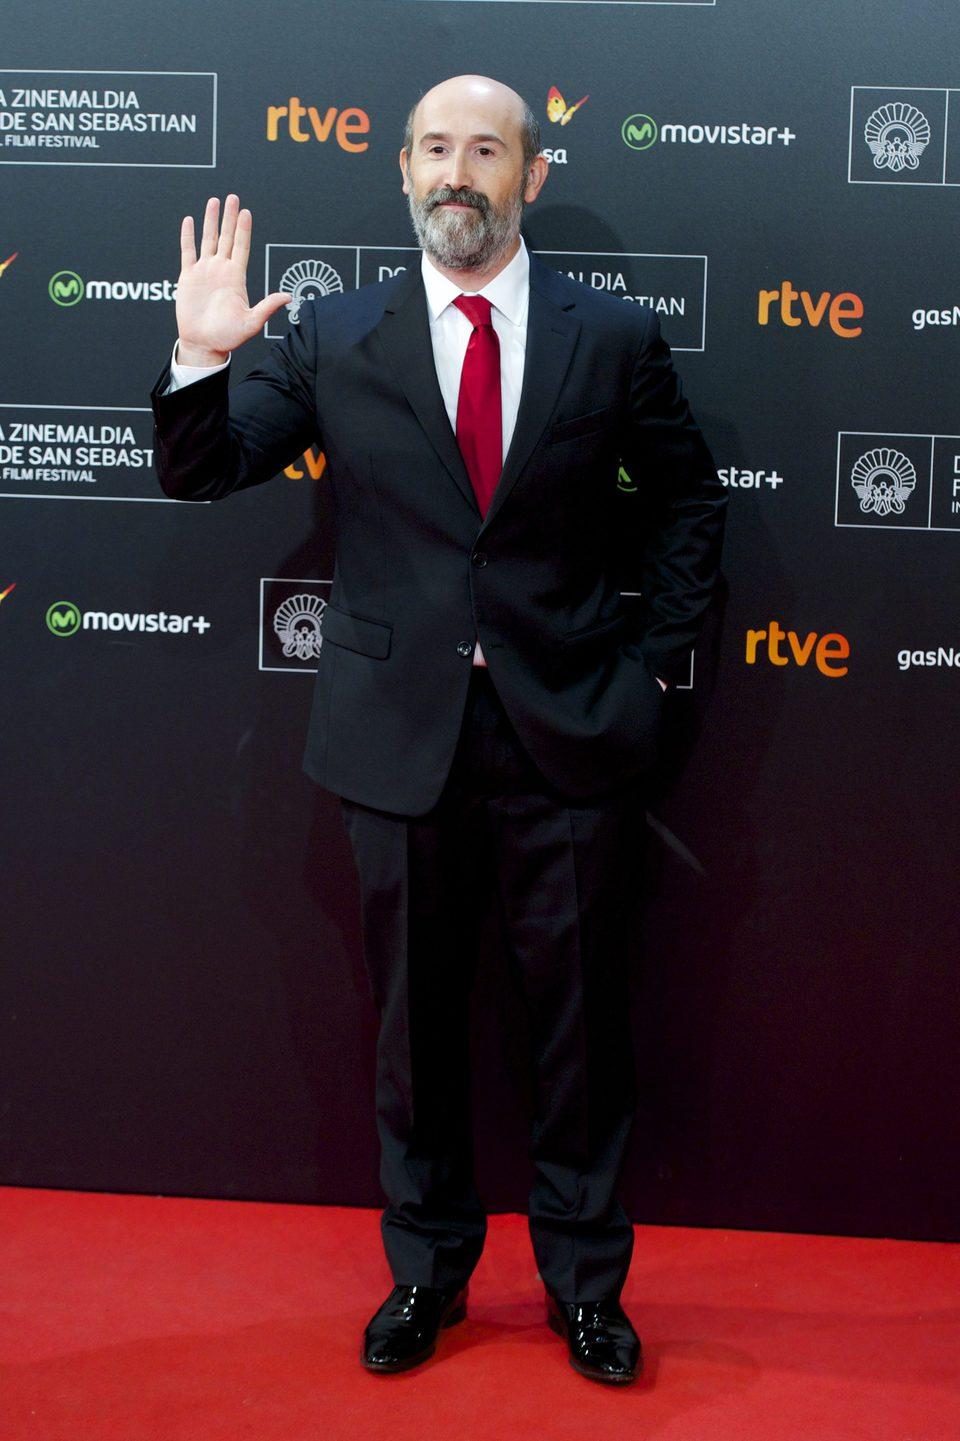 Javier Cámara posa en el Festival de Cine de San Sebastián 2015